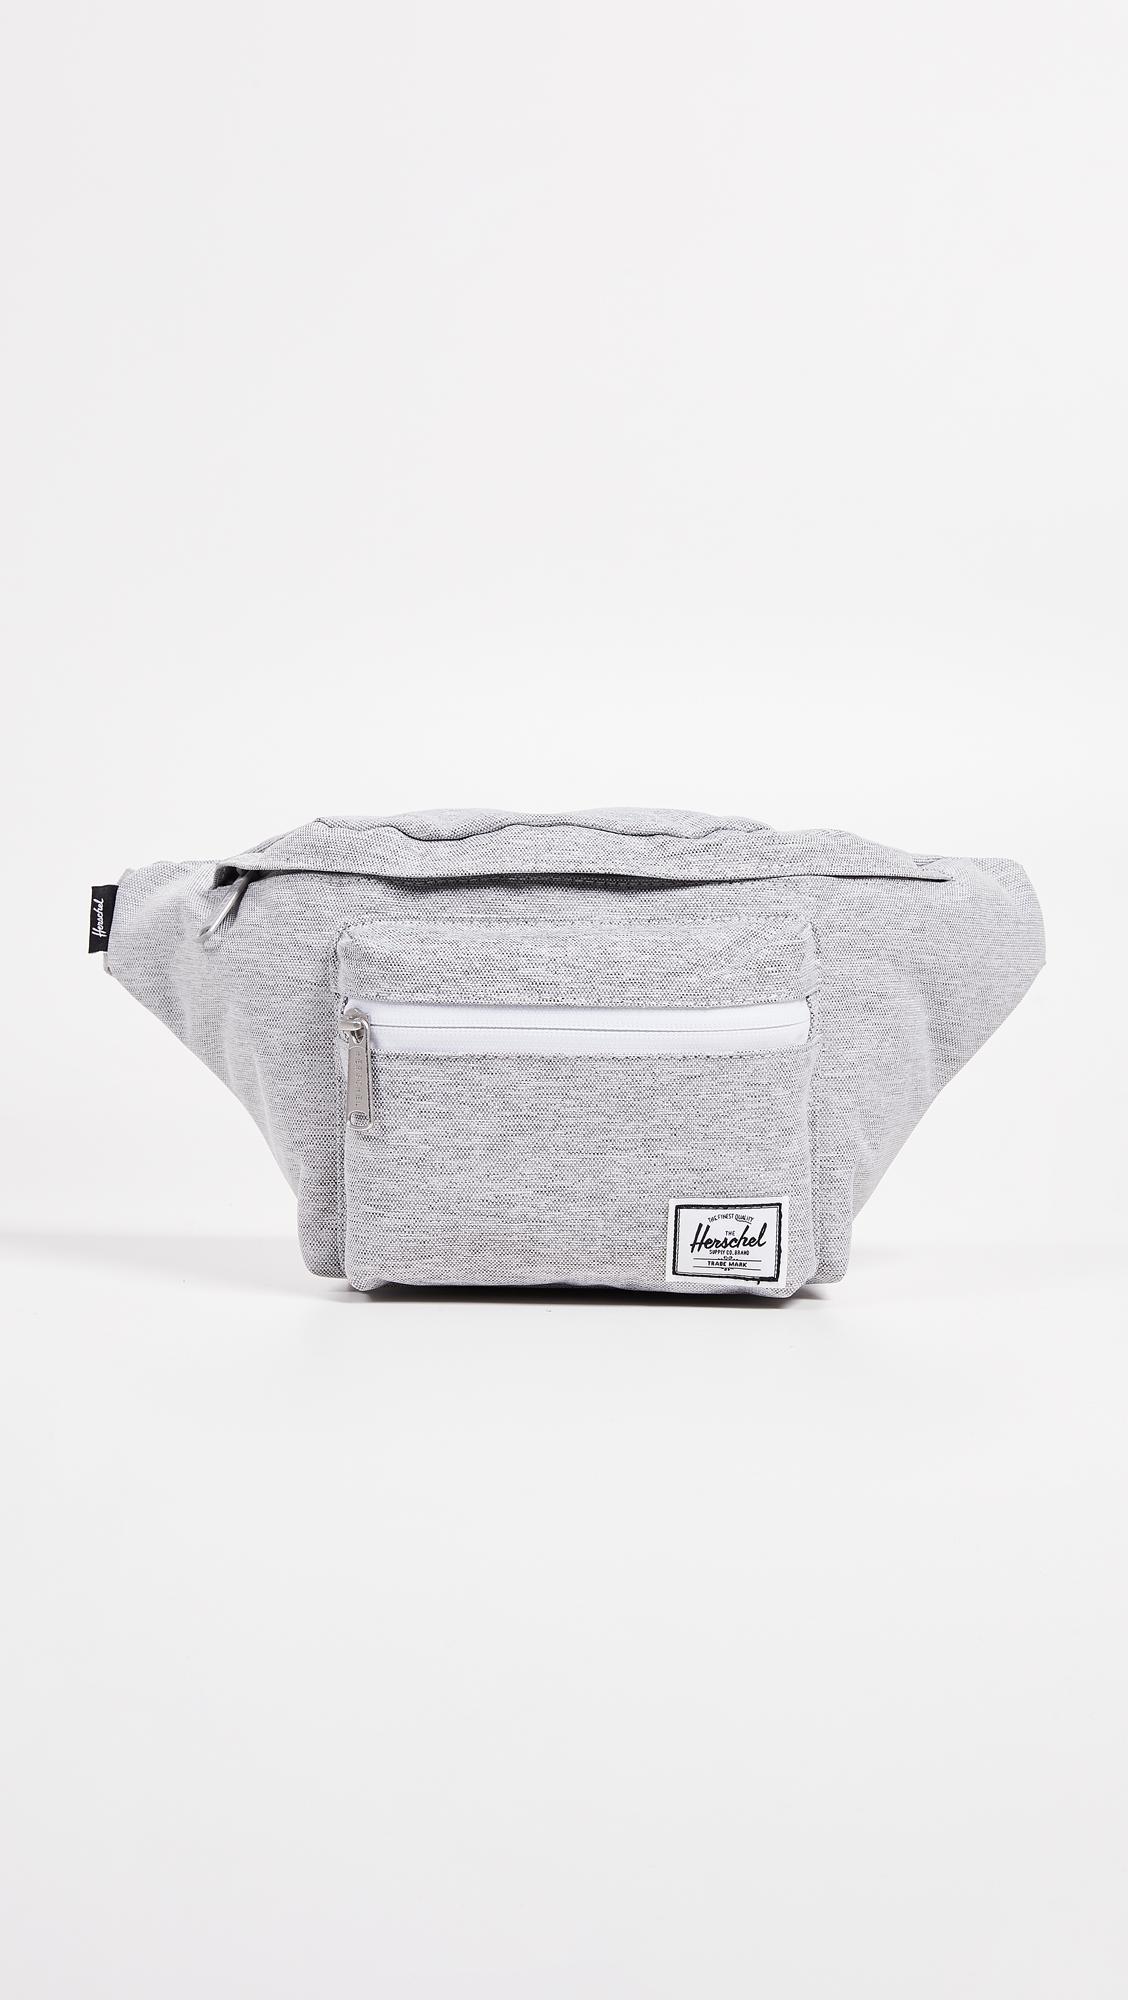 5a1bf206047 Lyst - Herschel Supply Co. Seventeen Hip Pack in Gray for Men